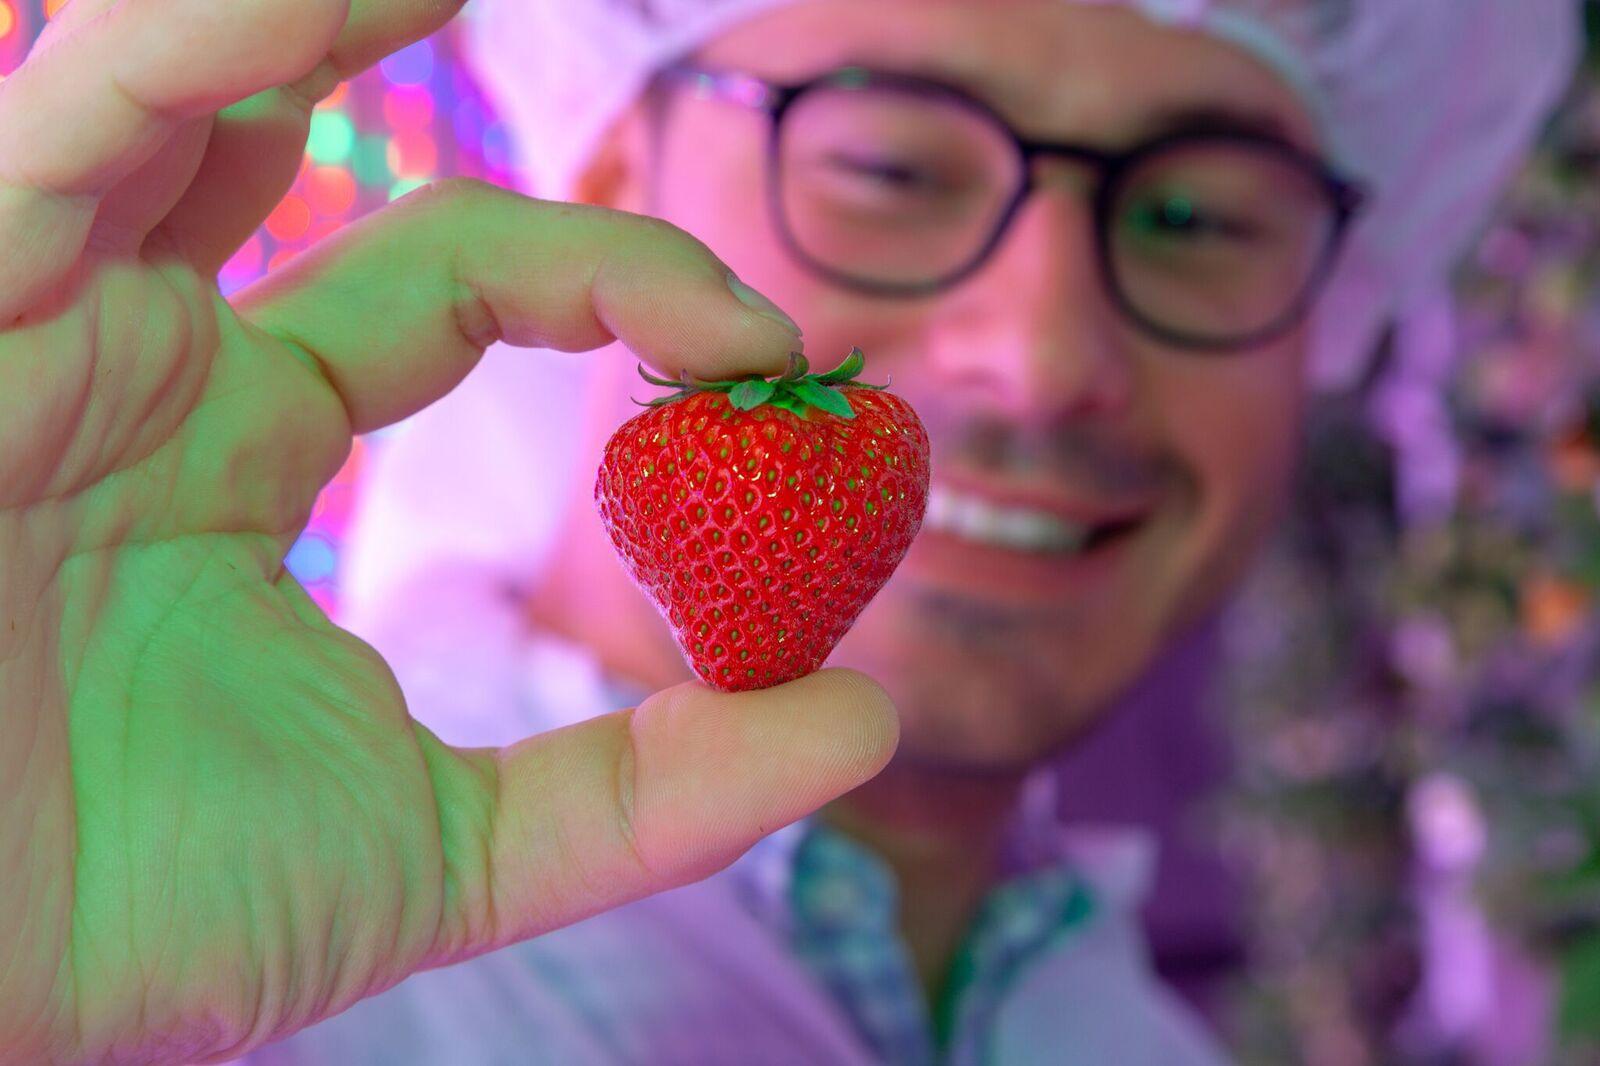 agricool strawberries dubai 2.jpeg